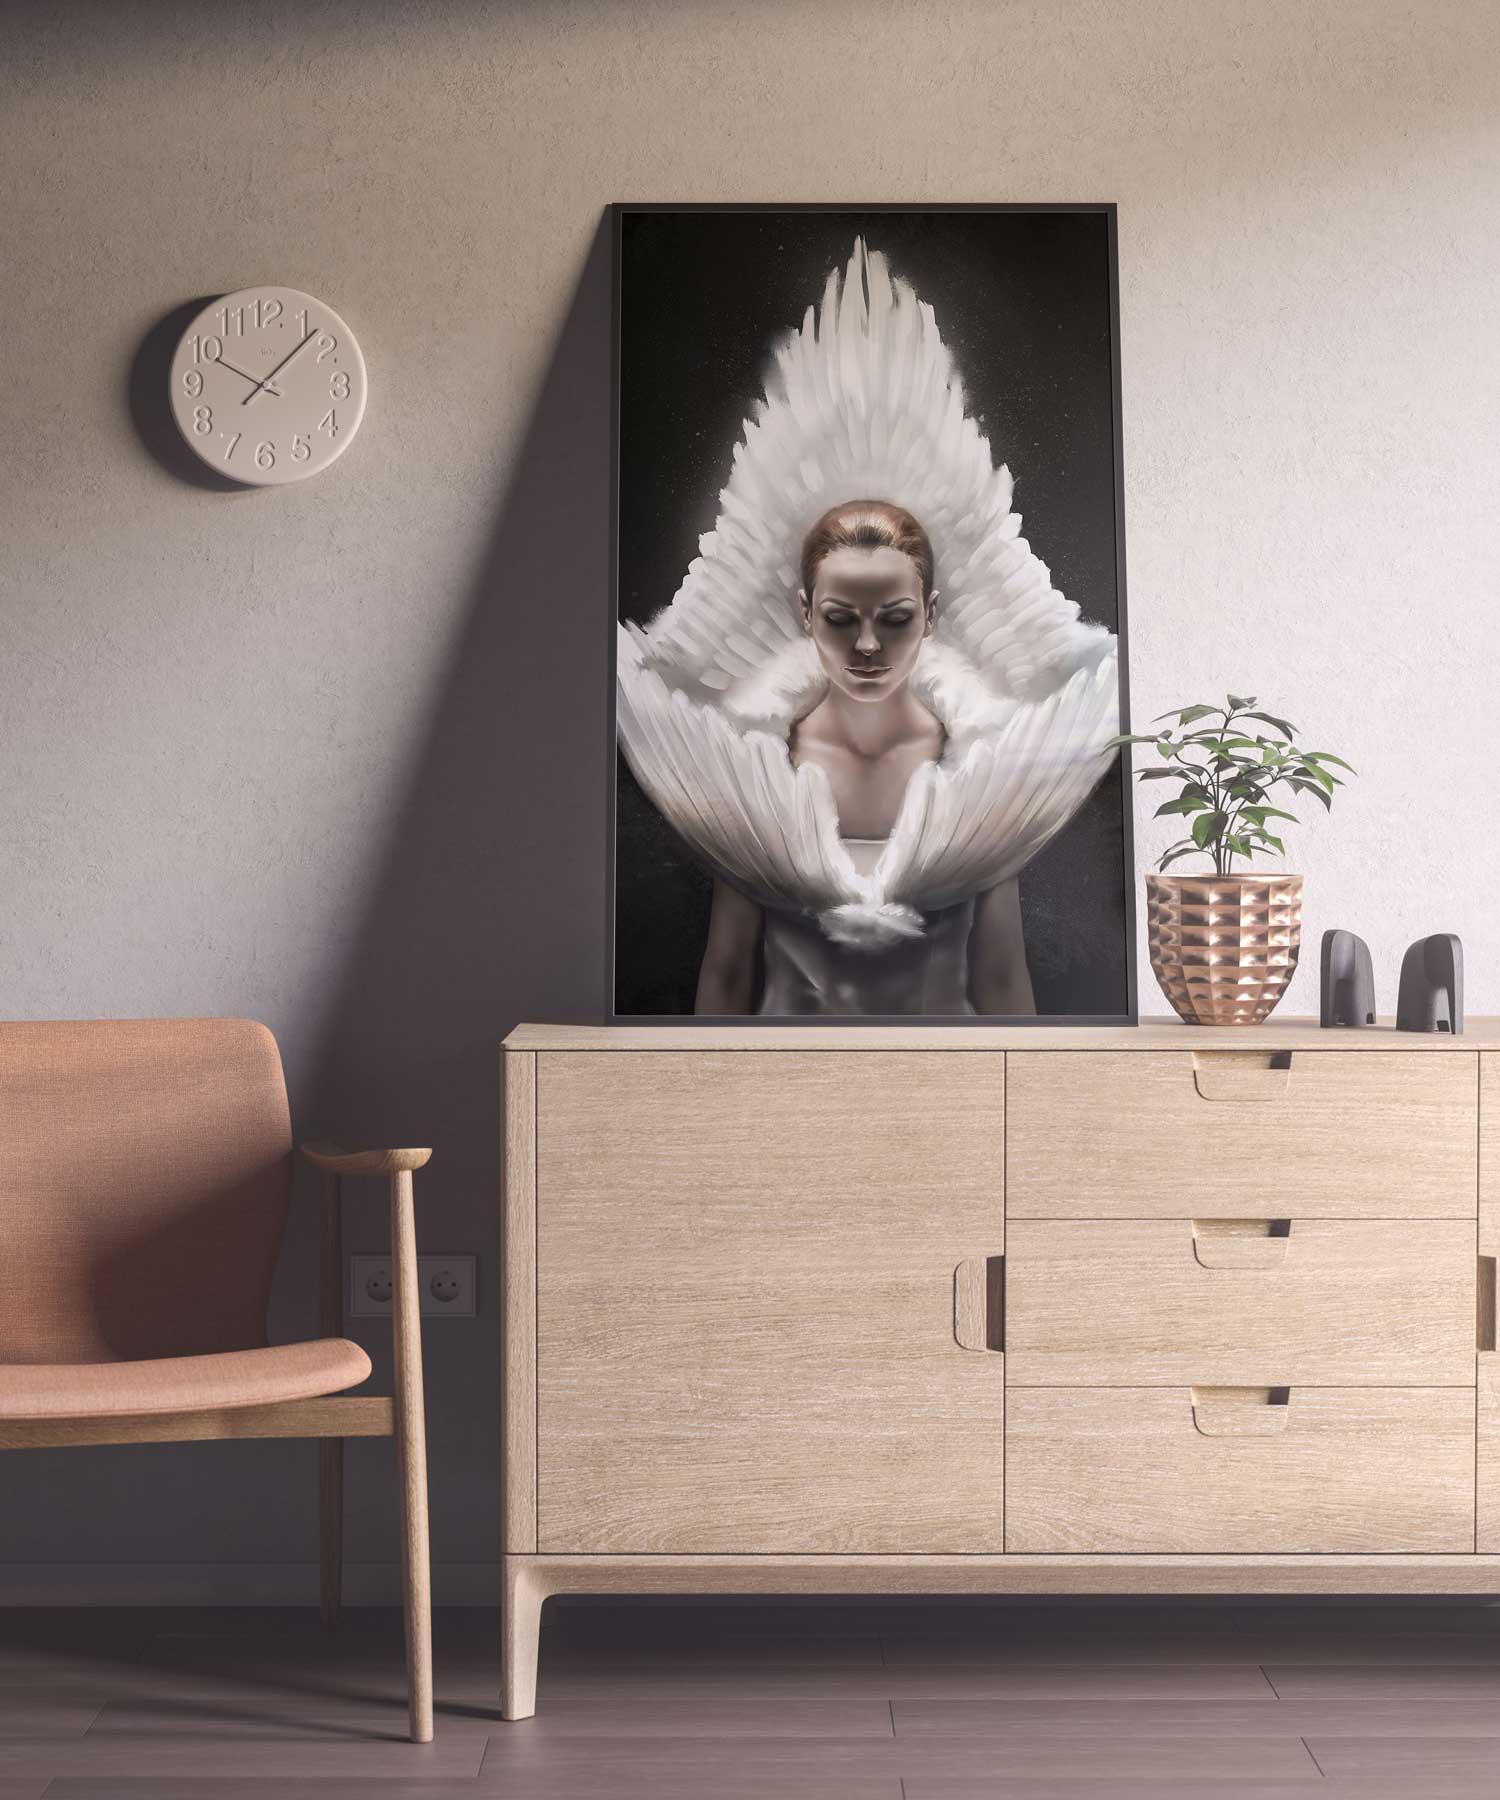 Framed print of digital portrait illustration sitting in living room.